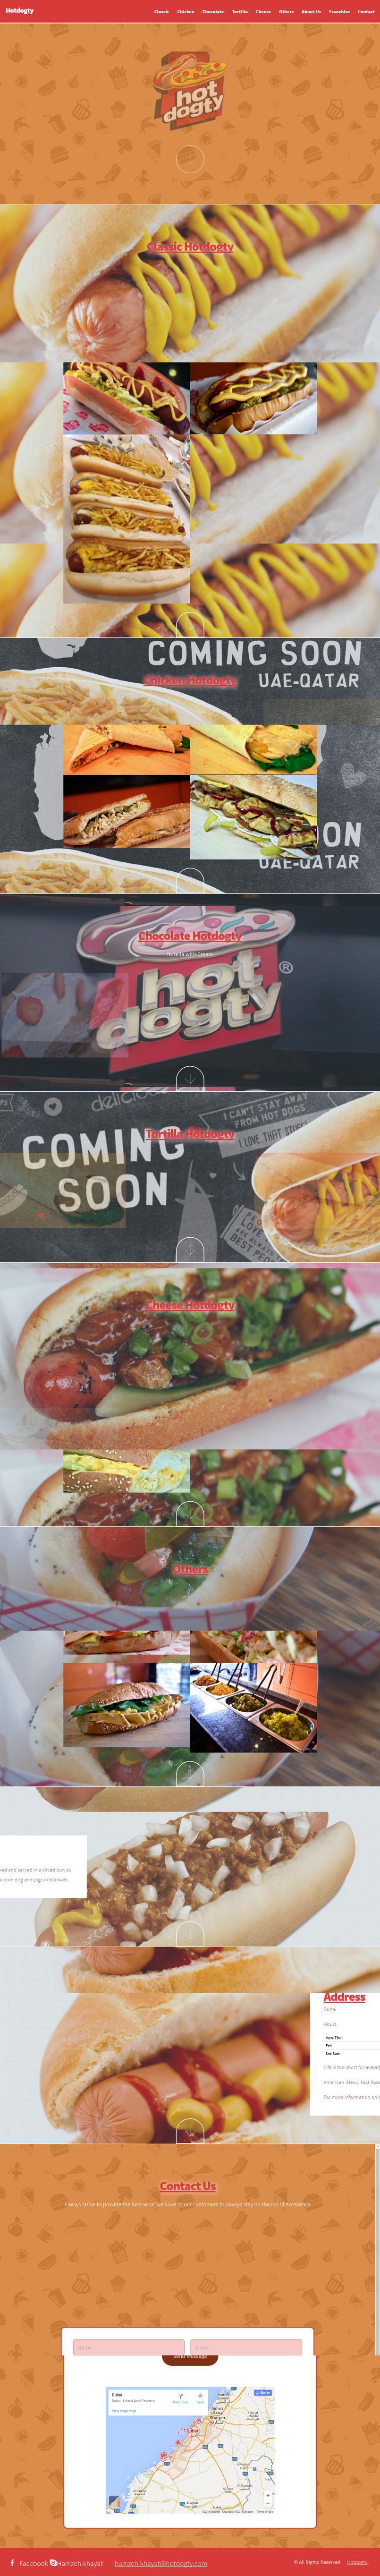 Hotdogty